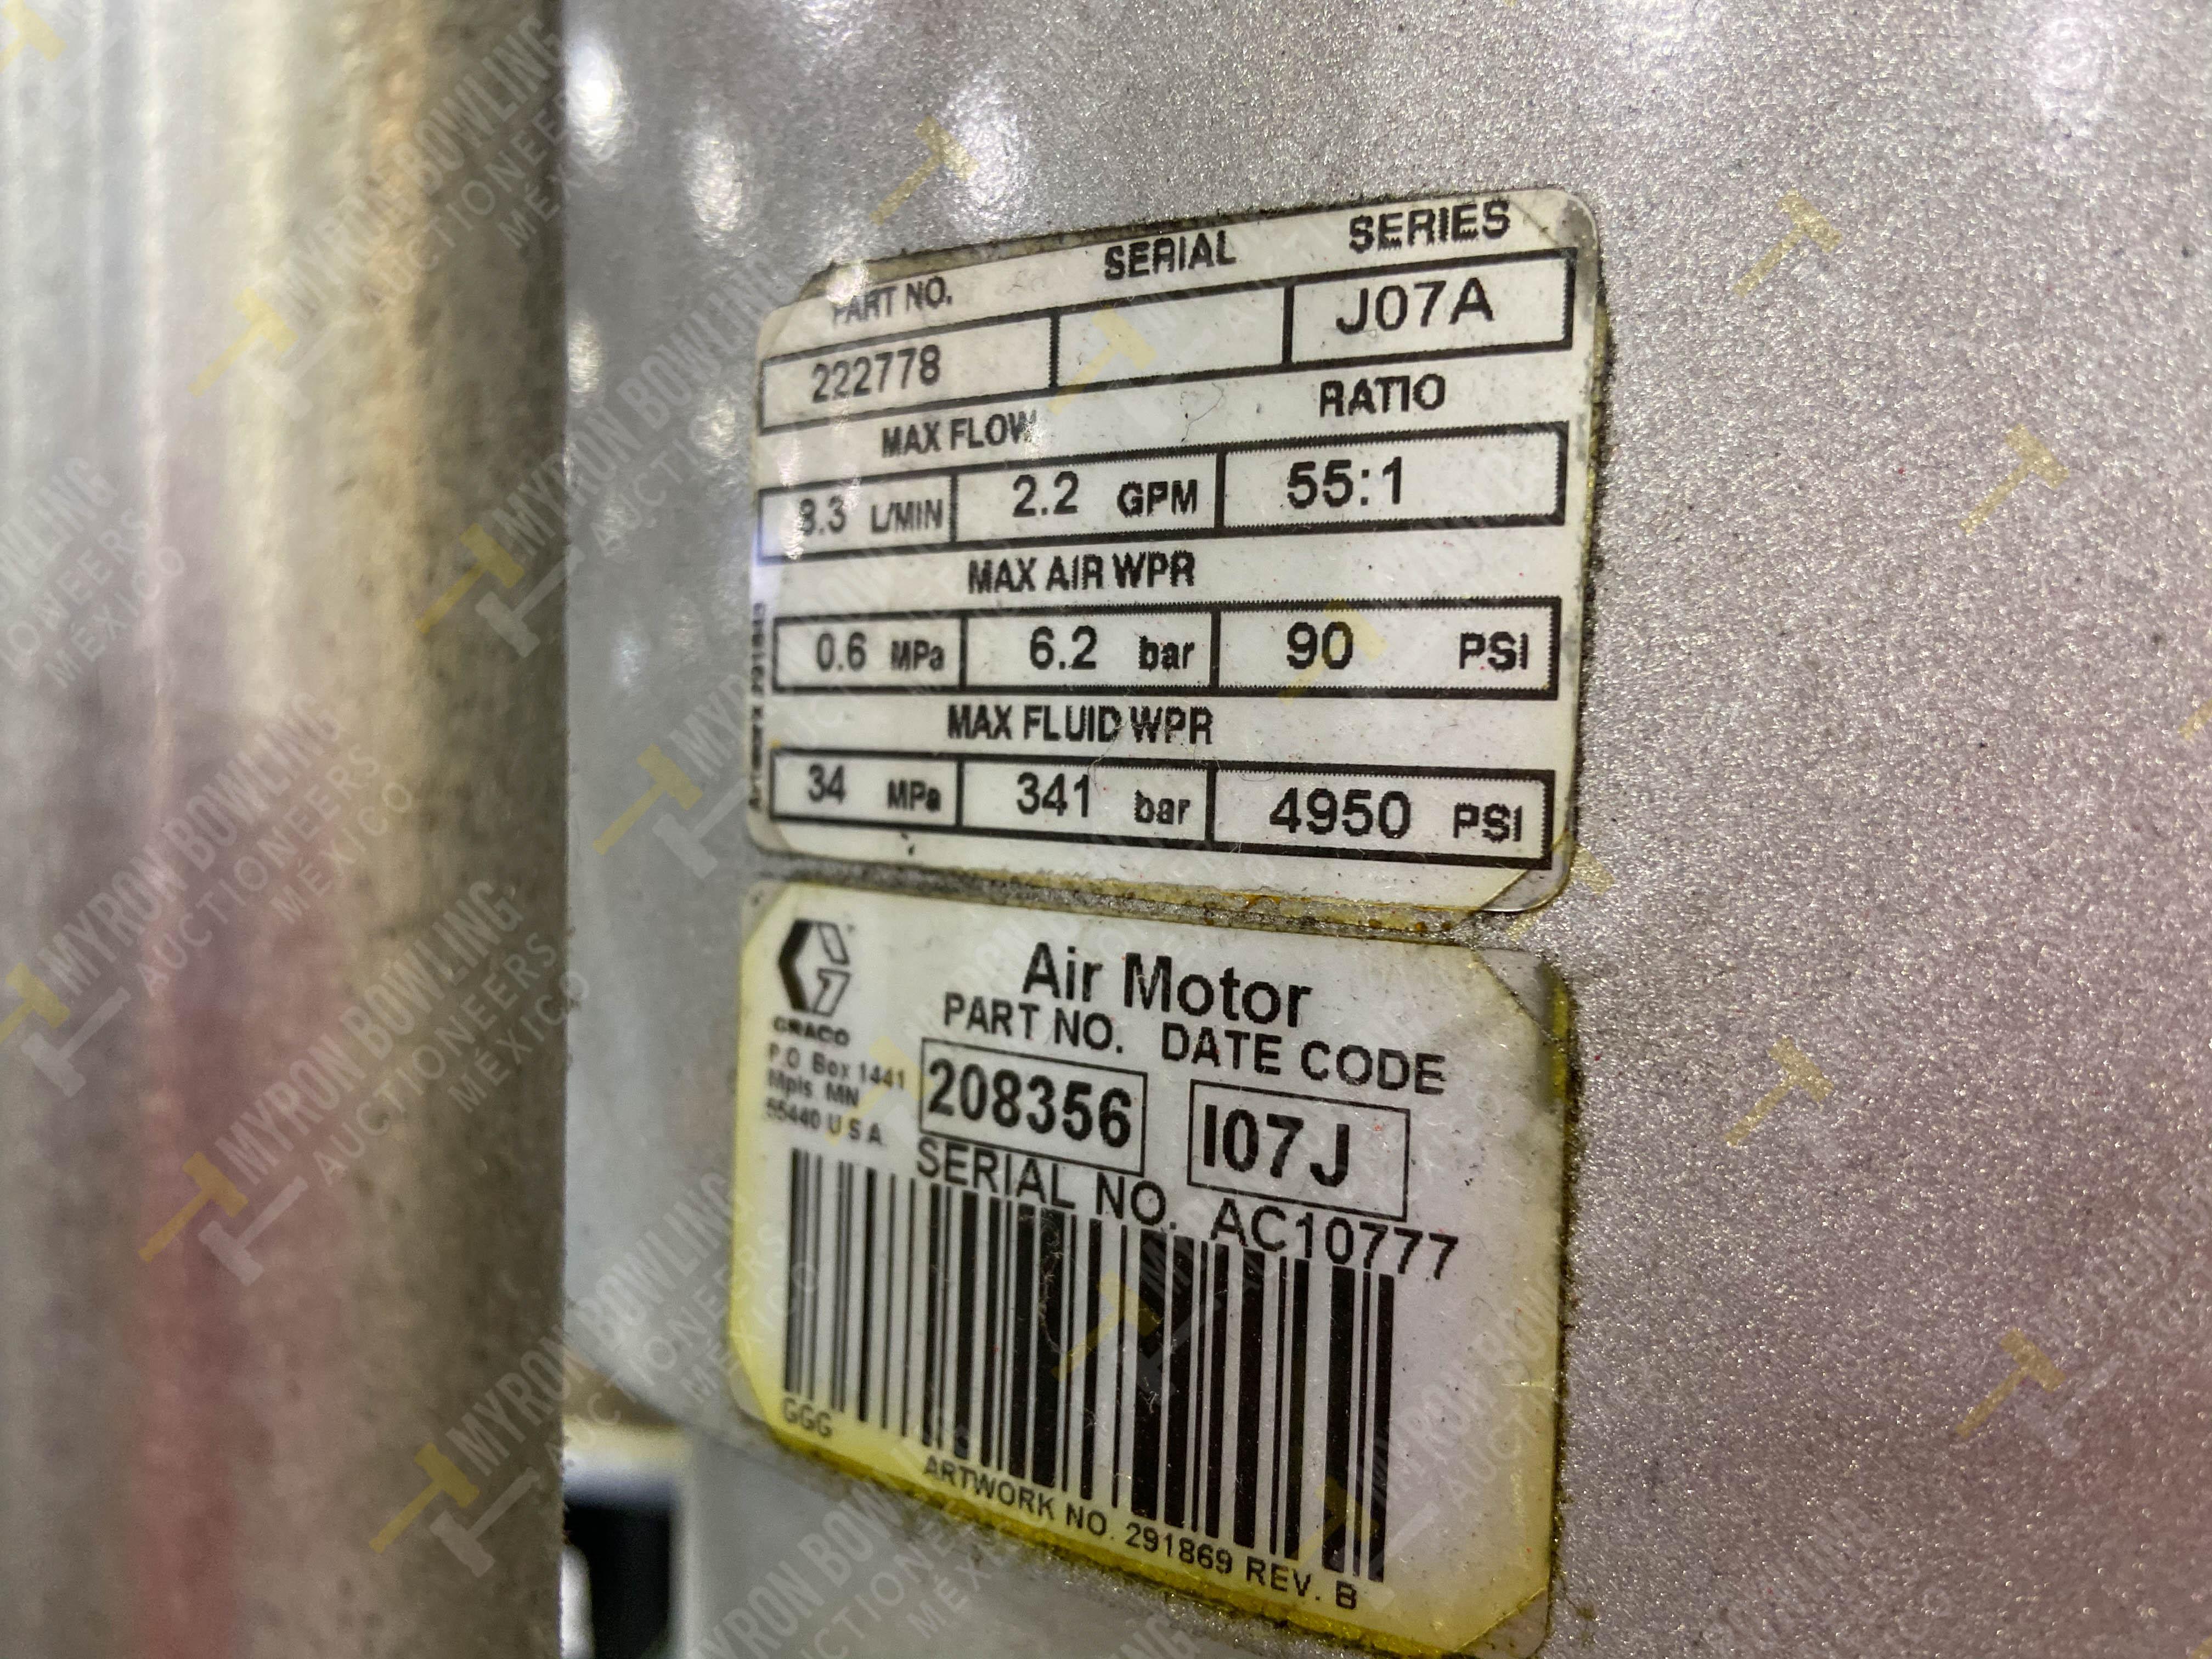 Dos sistemas de dispensador de sellador RTV (bombas) marca Graco Bulldog, 8.3 L/min max - Image 11 of 12